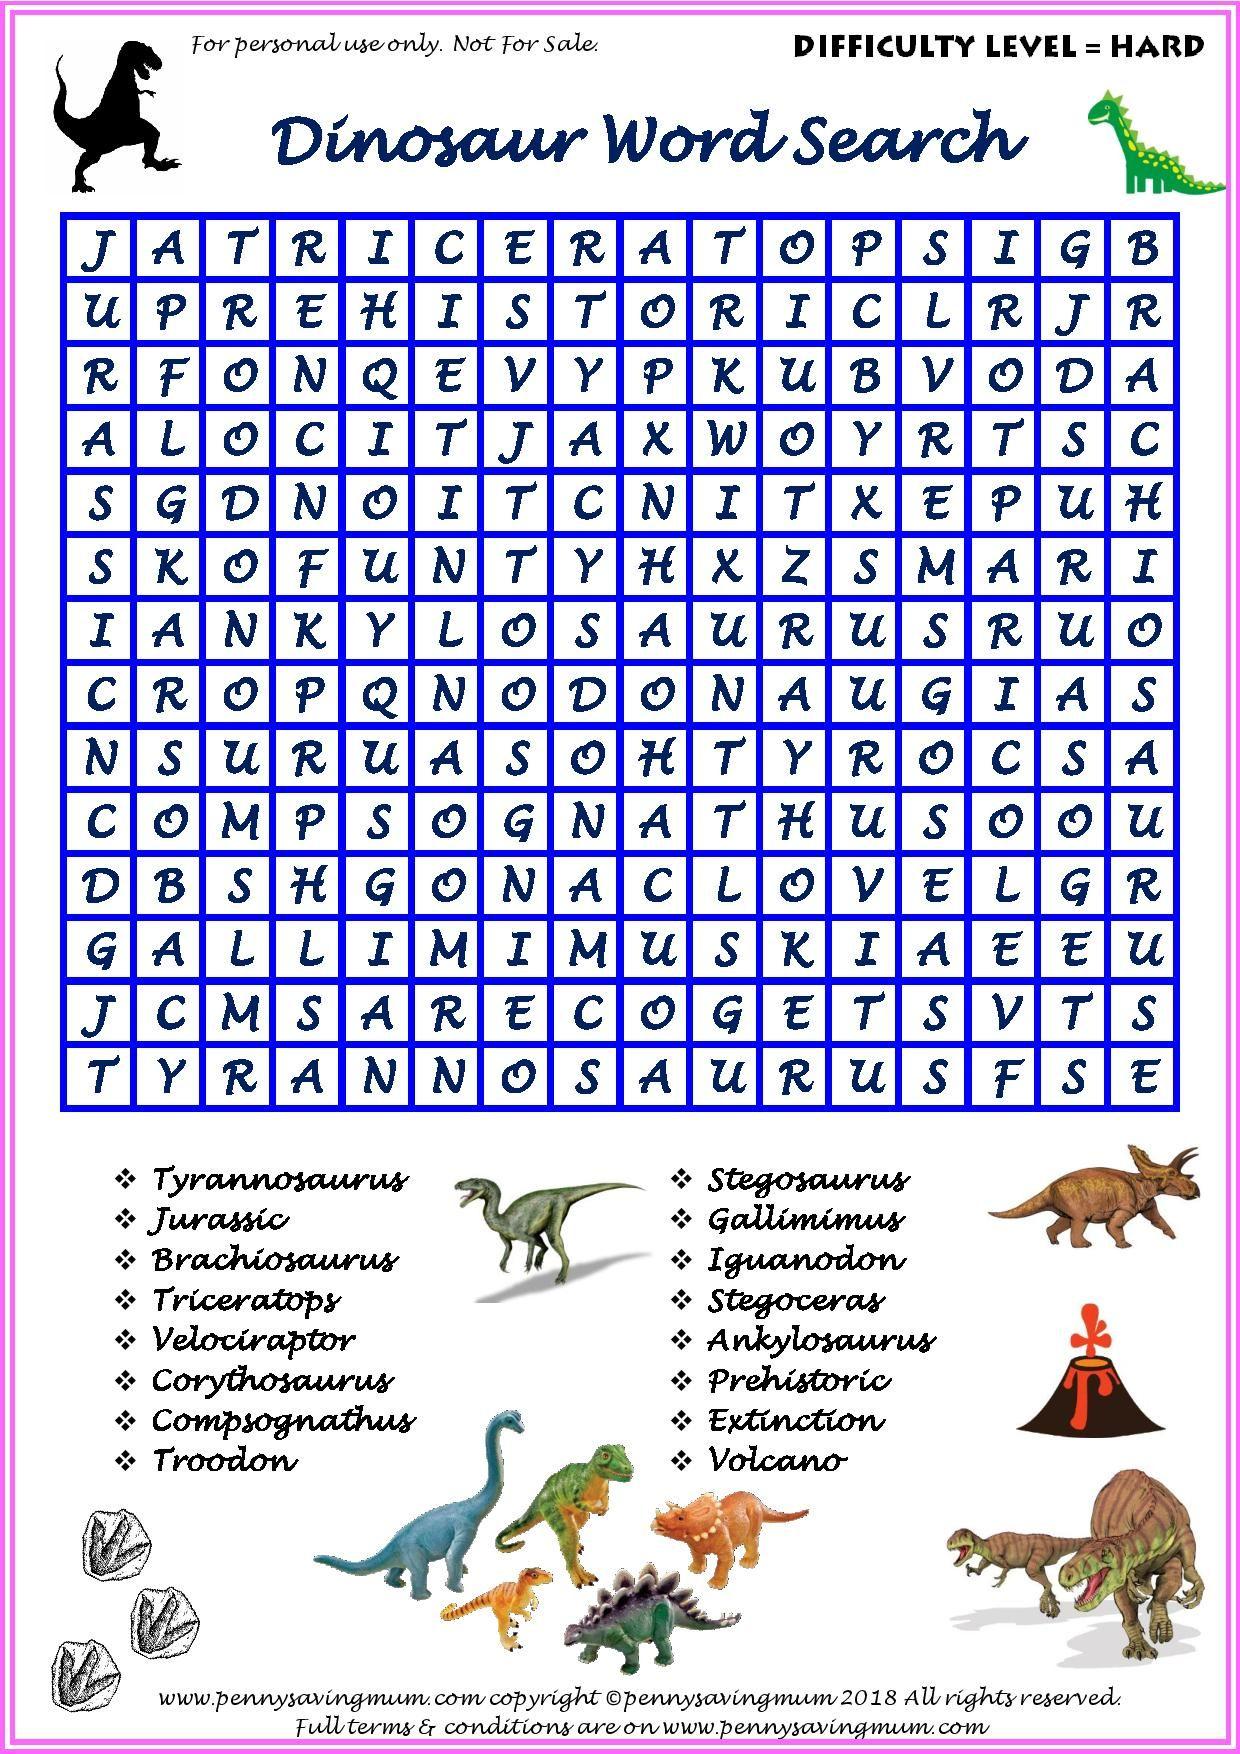 Word Search Dinosaur Hard Version